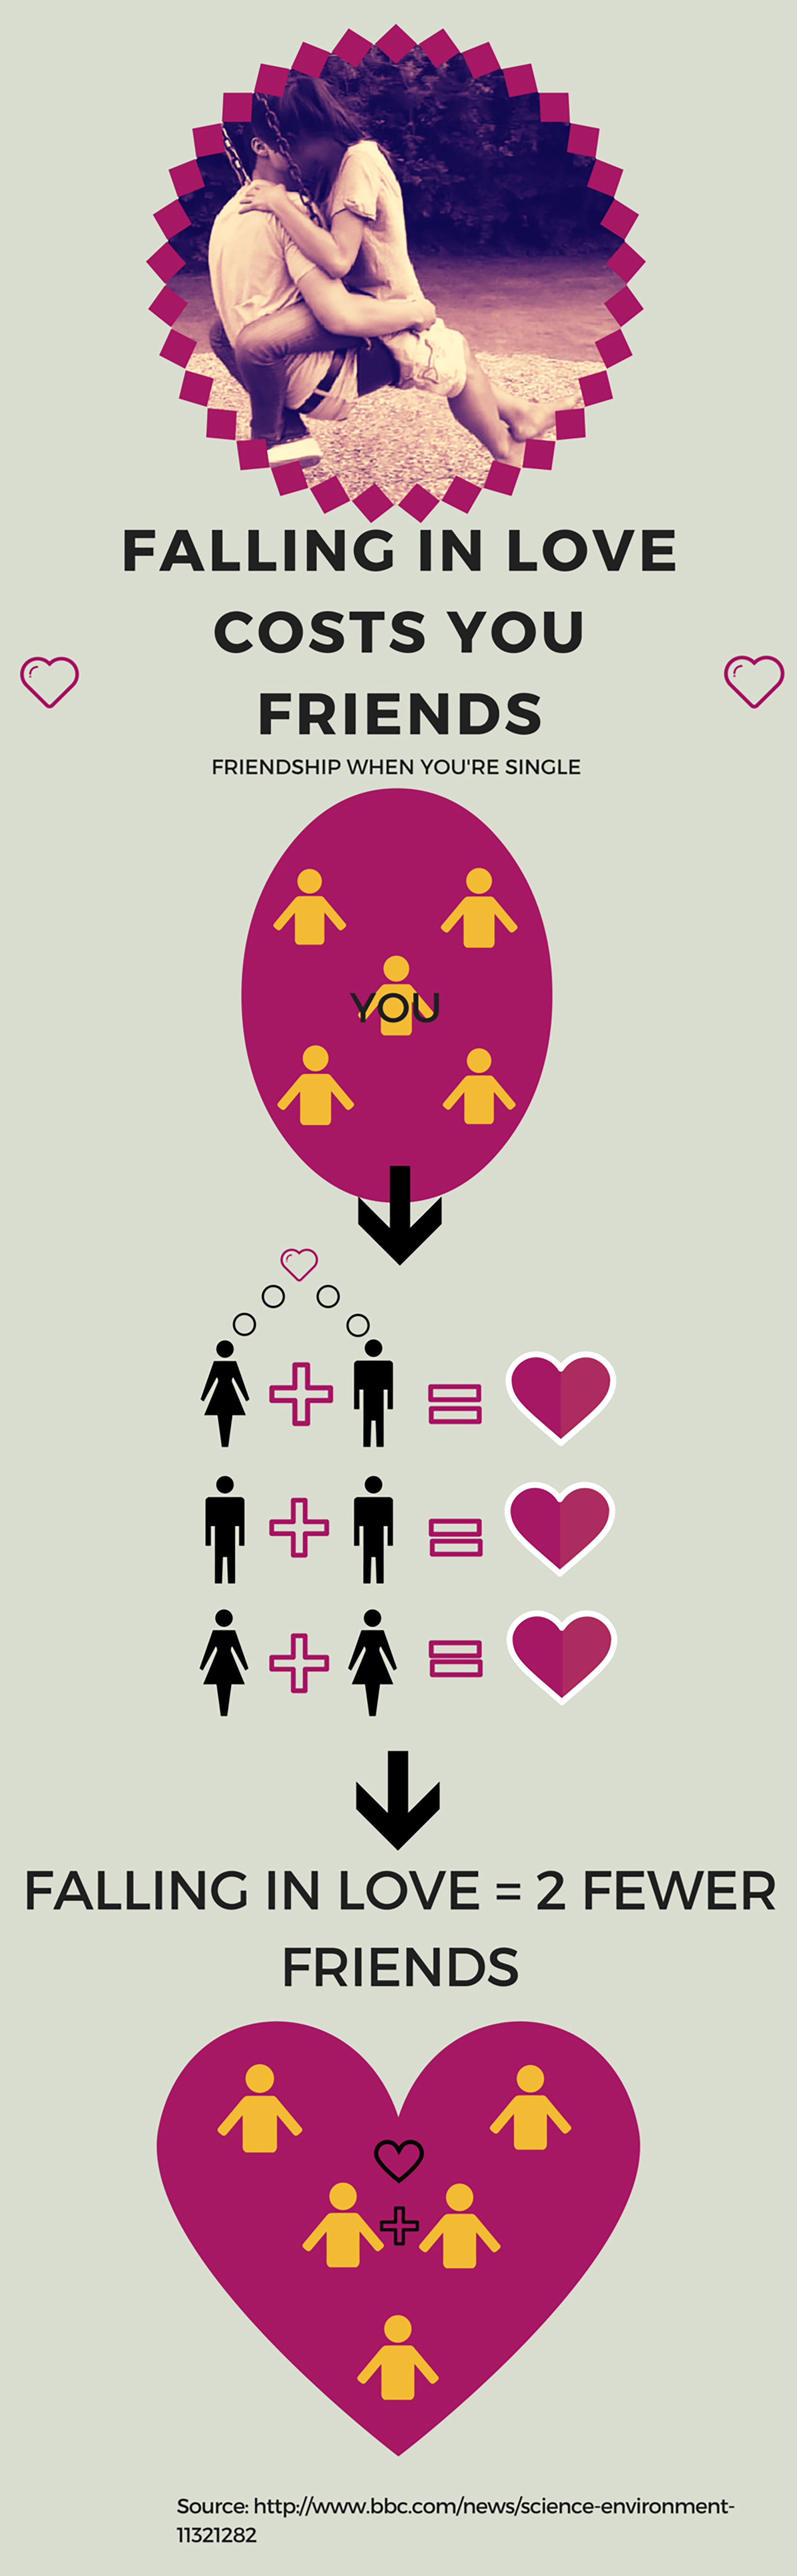 Falling in Love Costs You Friends